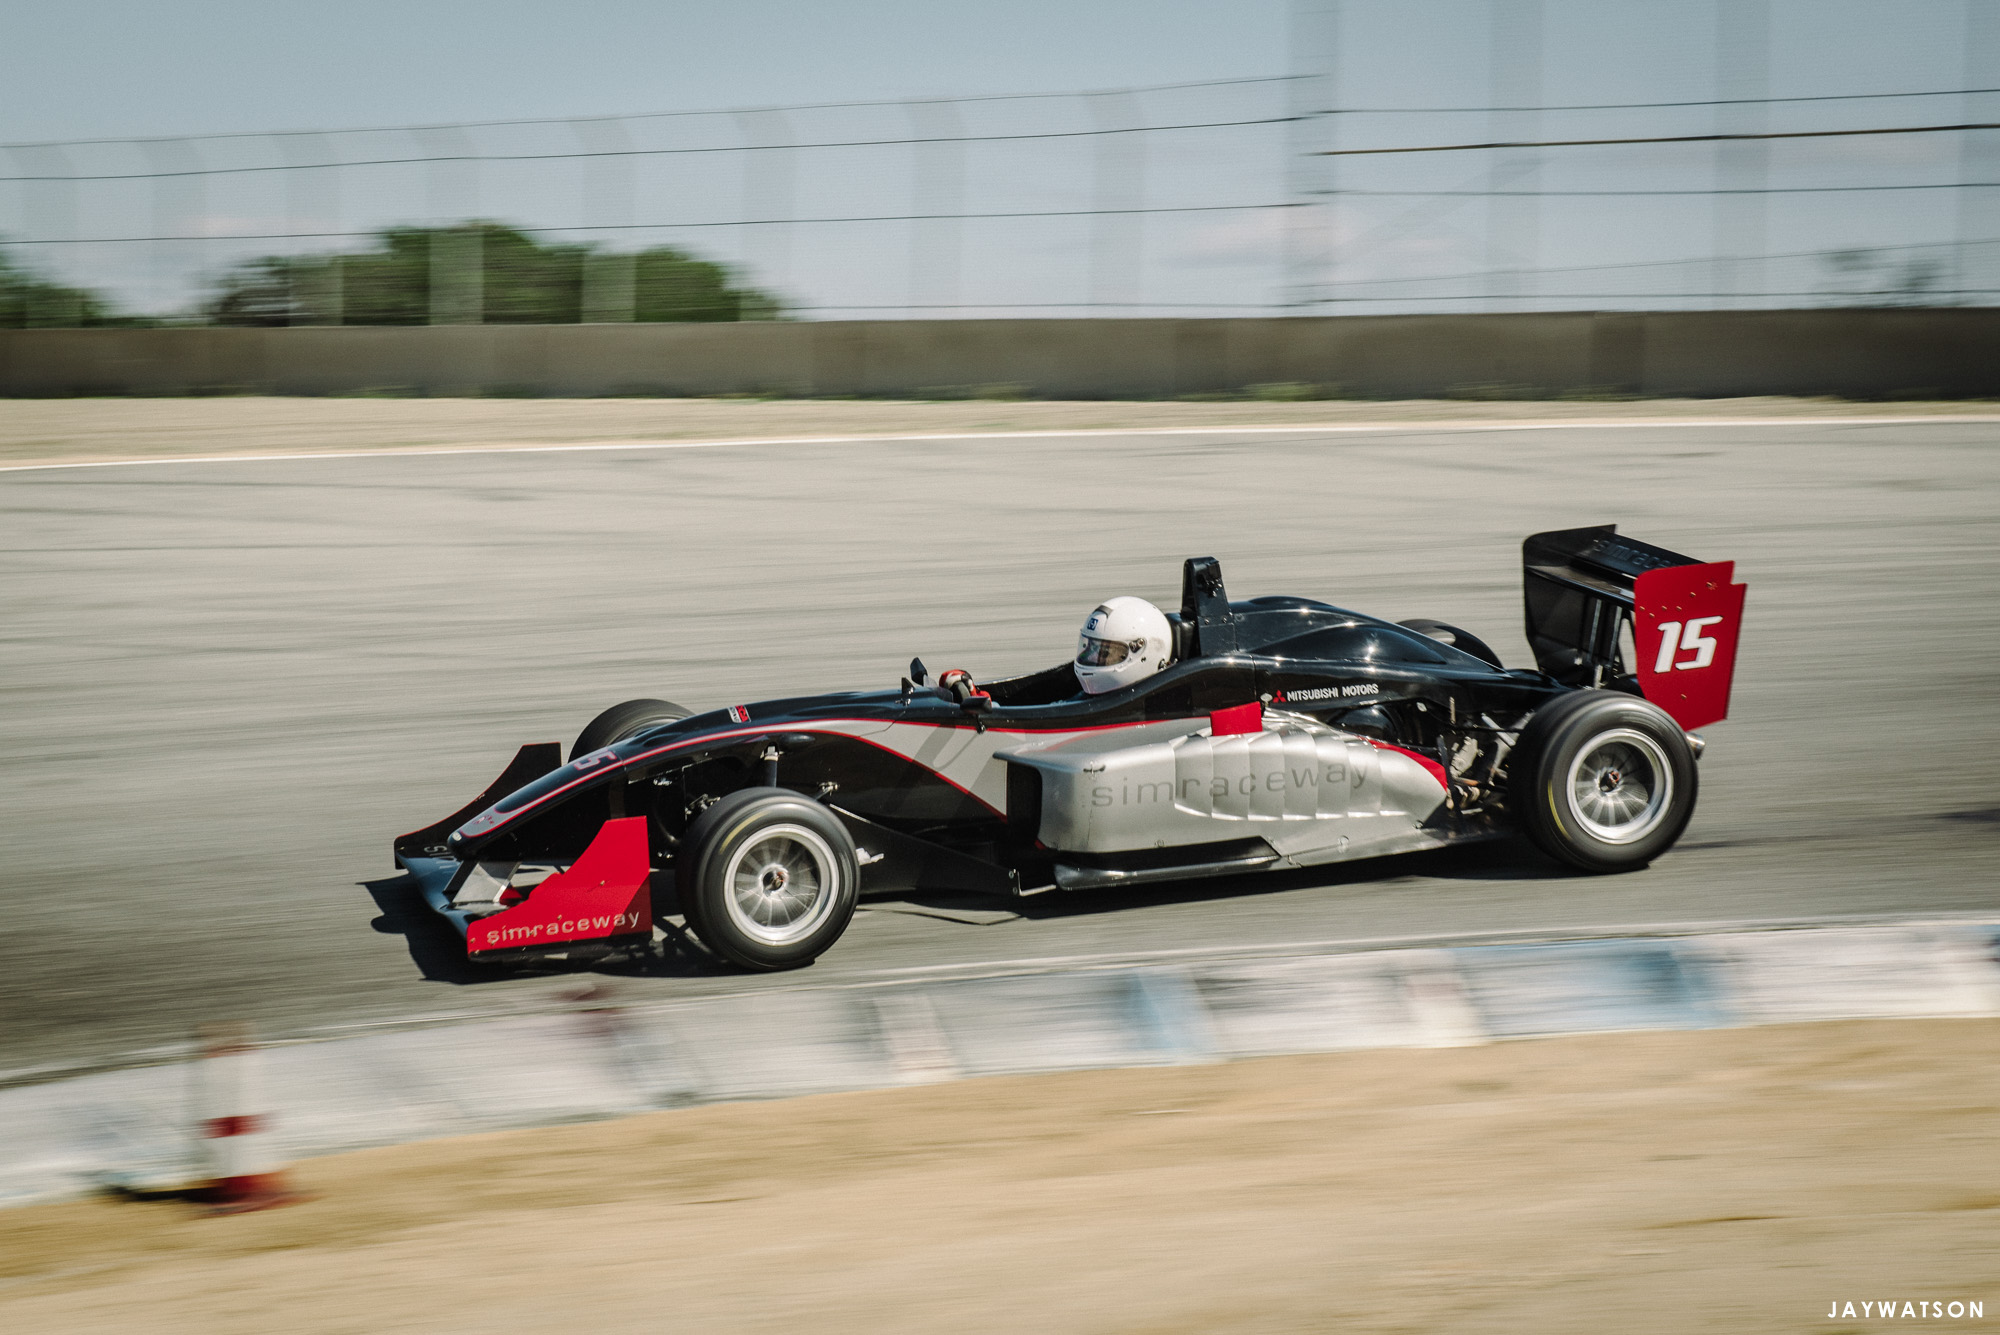 F3 Racing at Mazda Raceway Laguna Seca for Simraceway